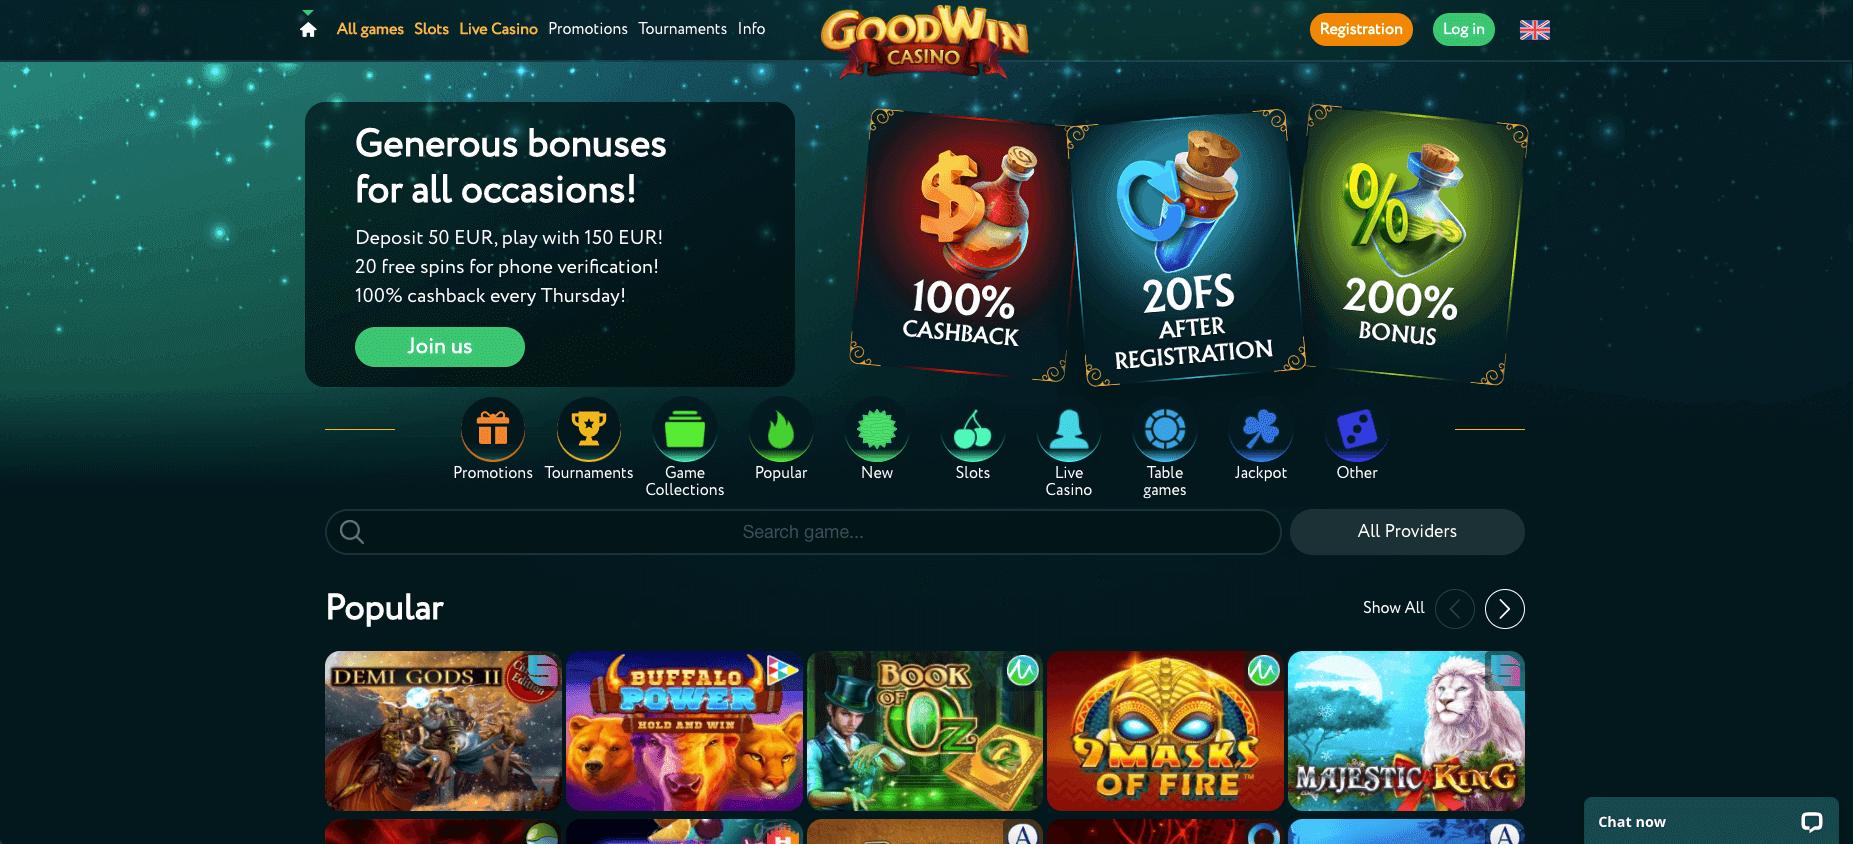 Goodwin Casino